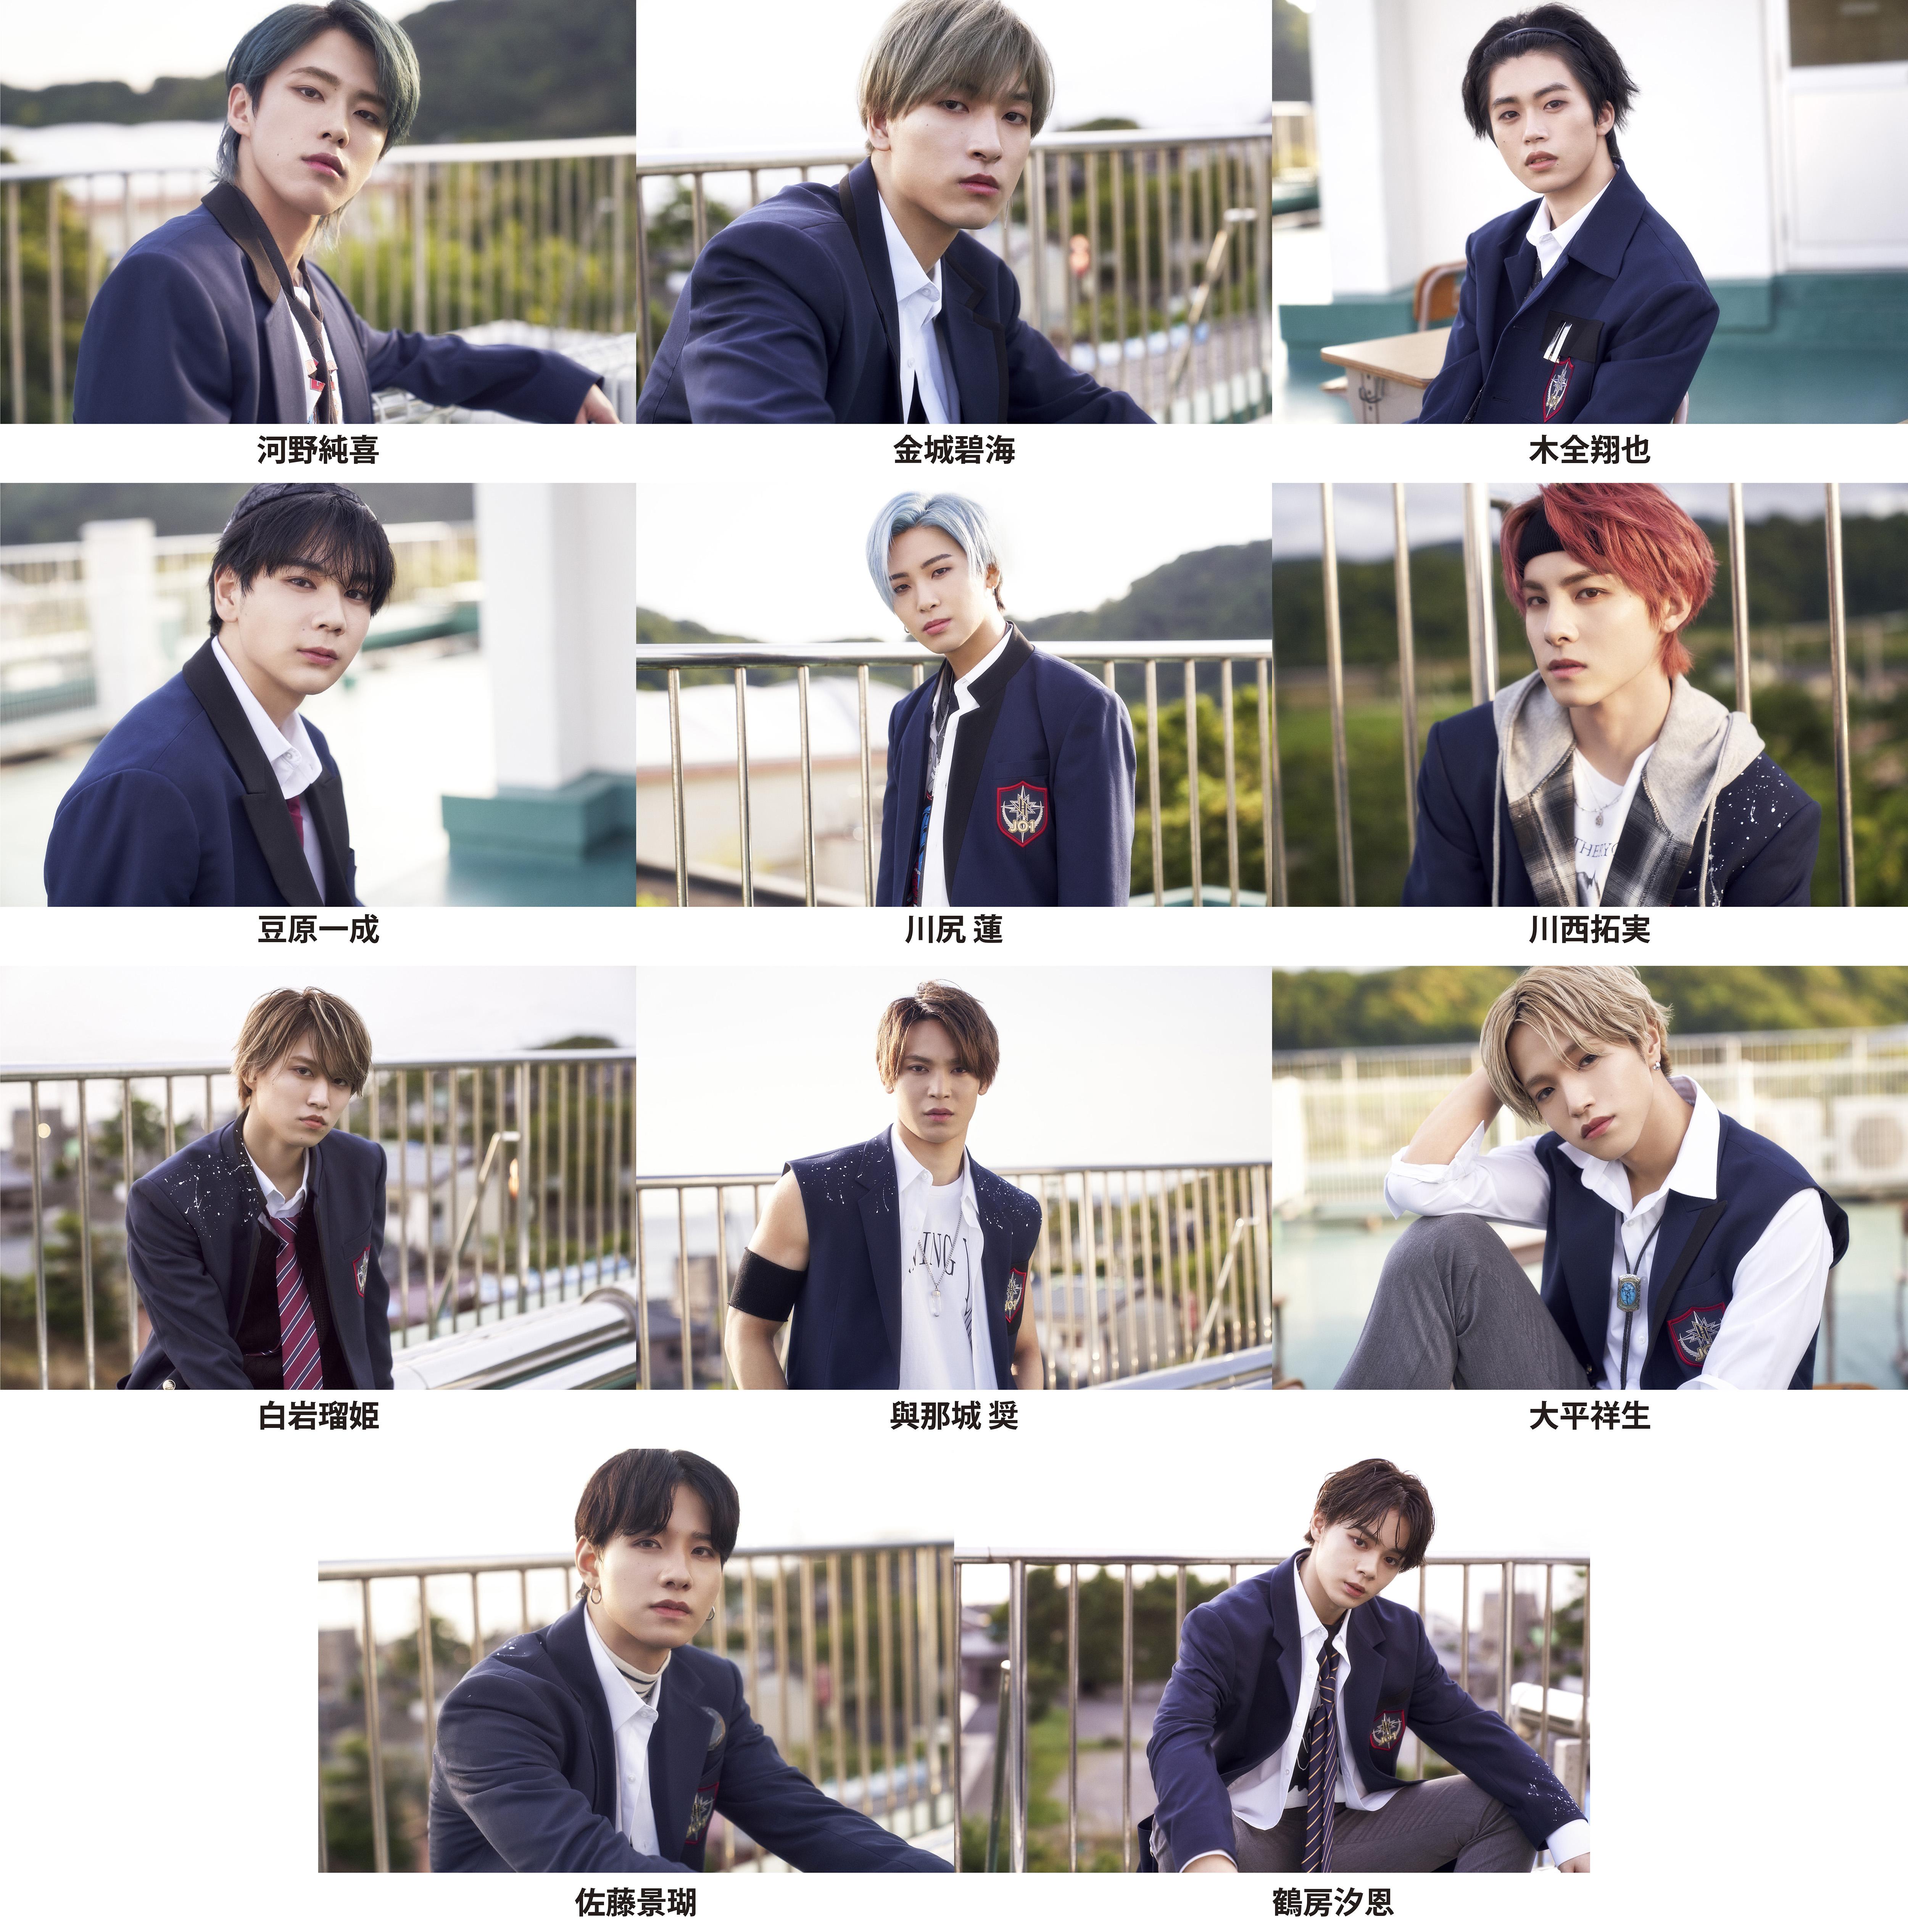 「JO1メンバーたち」画像